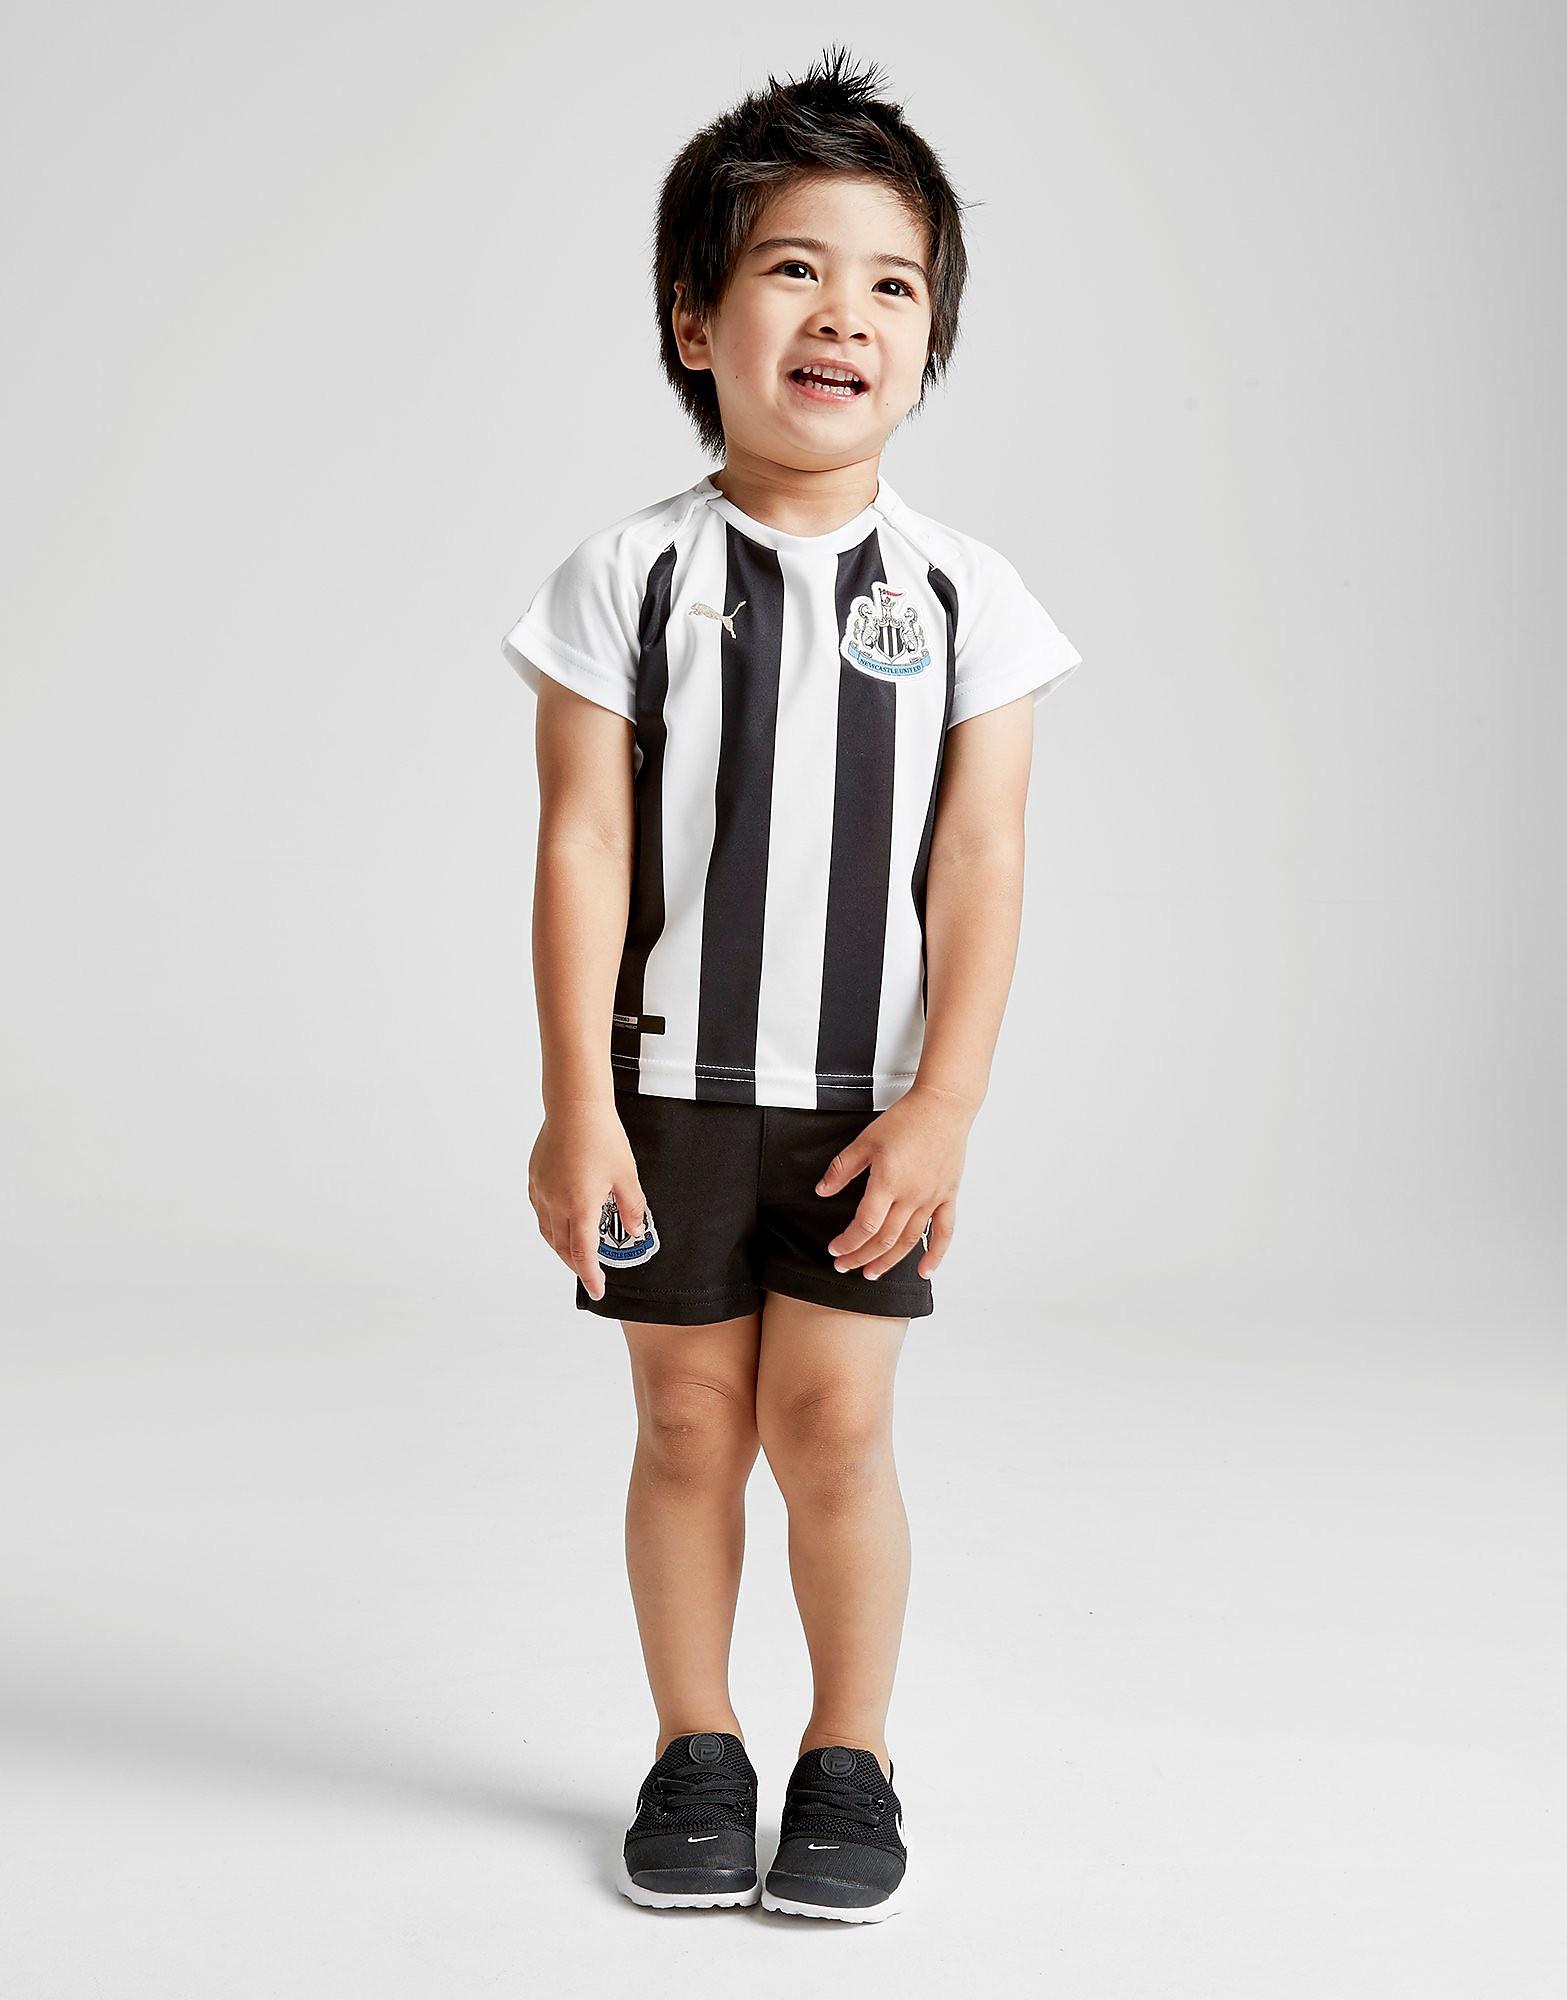 PUMA Newcastle United 18/19 Home Kit Baby's - Zwart - Kind